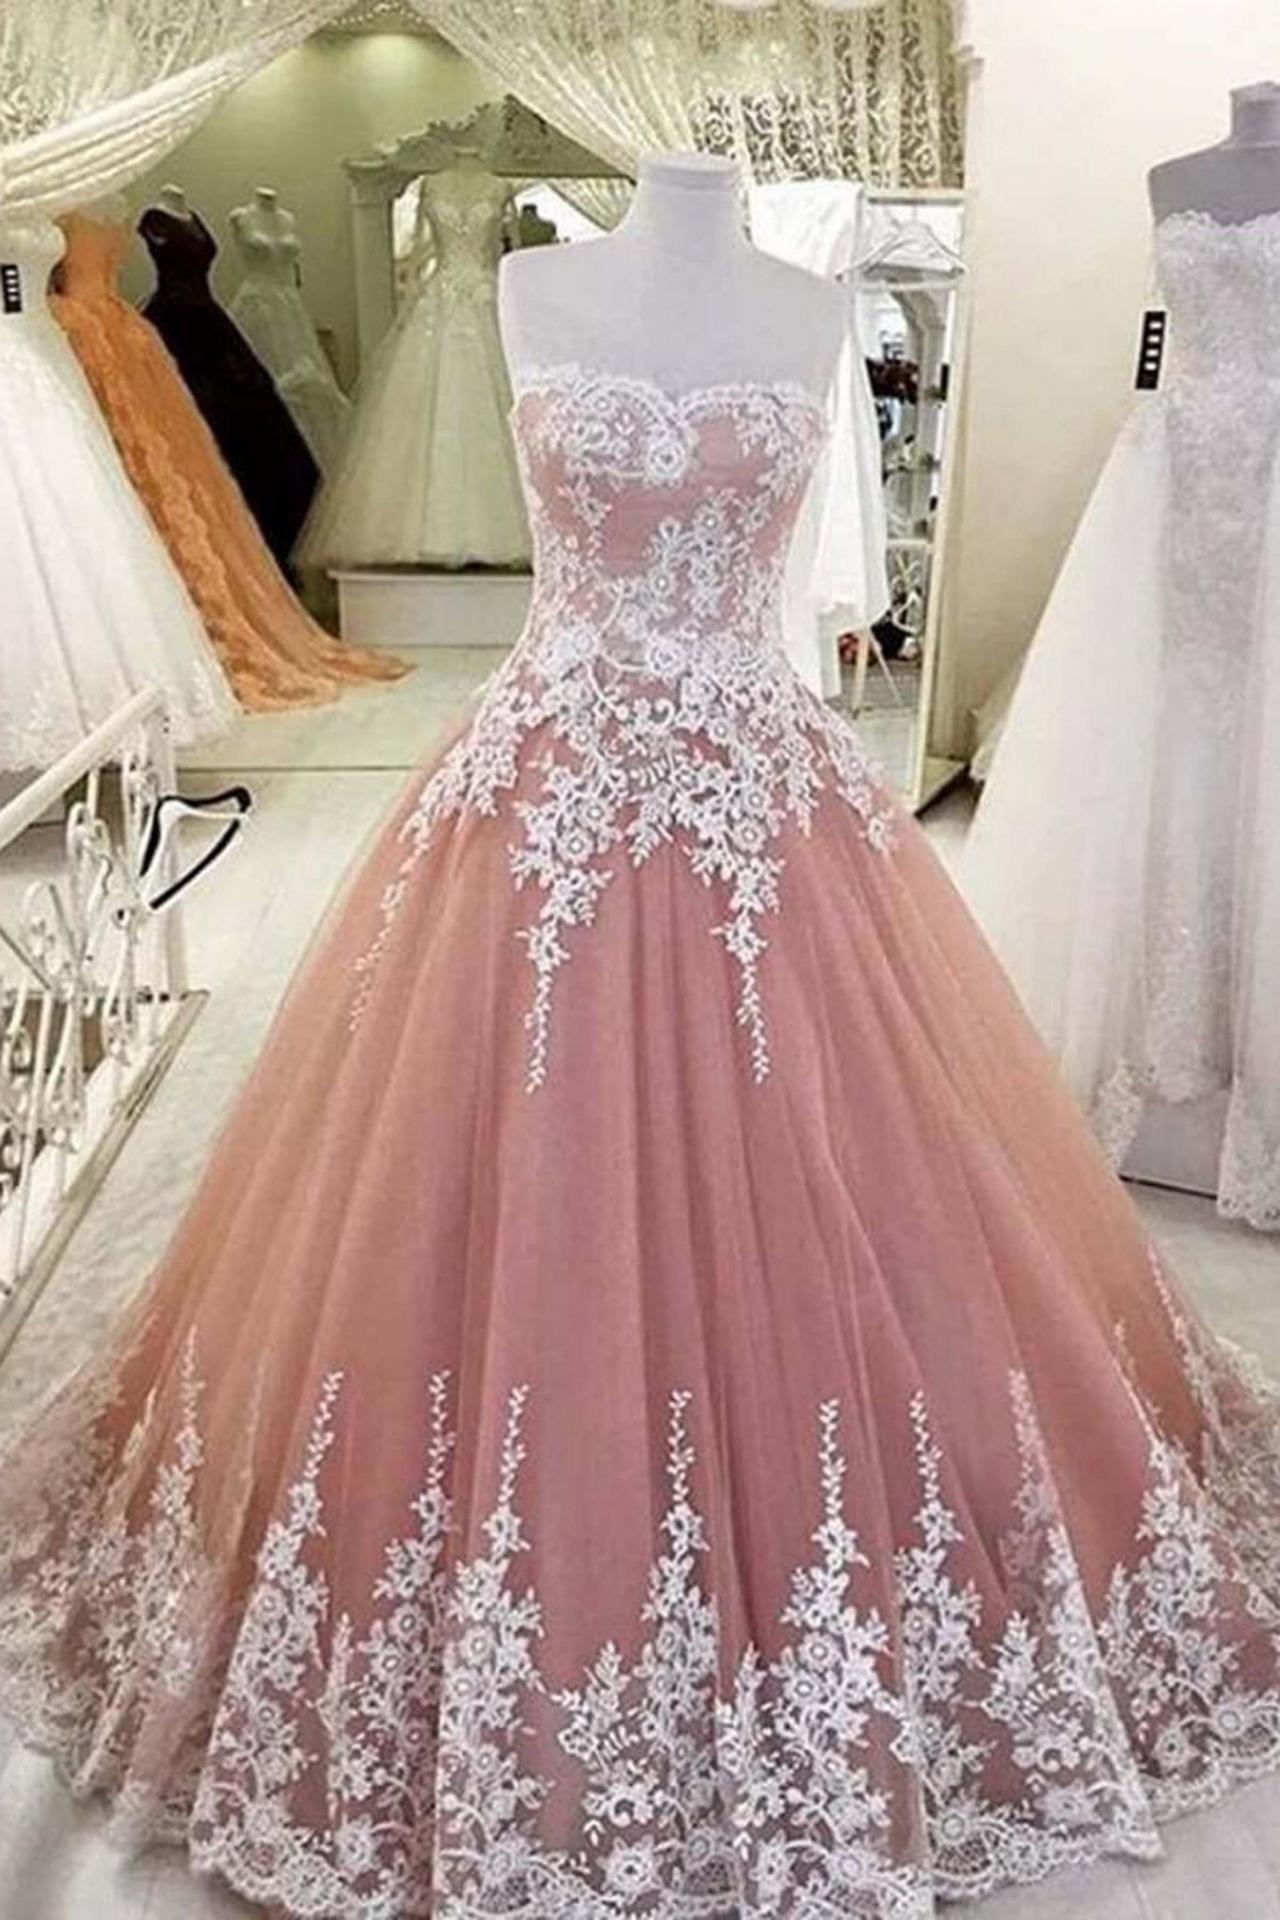 Organze prom dress sweetheart dress cute pink organza lace